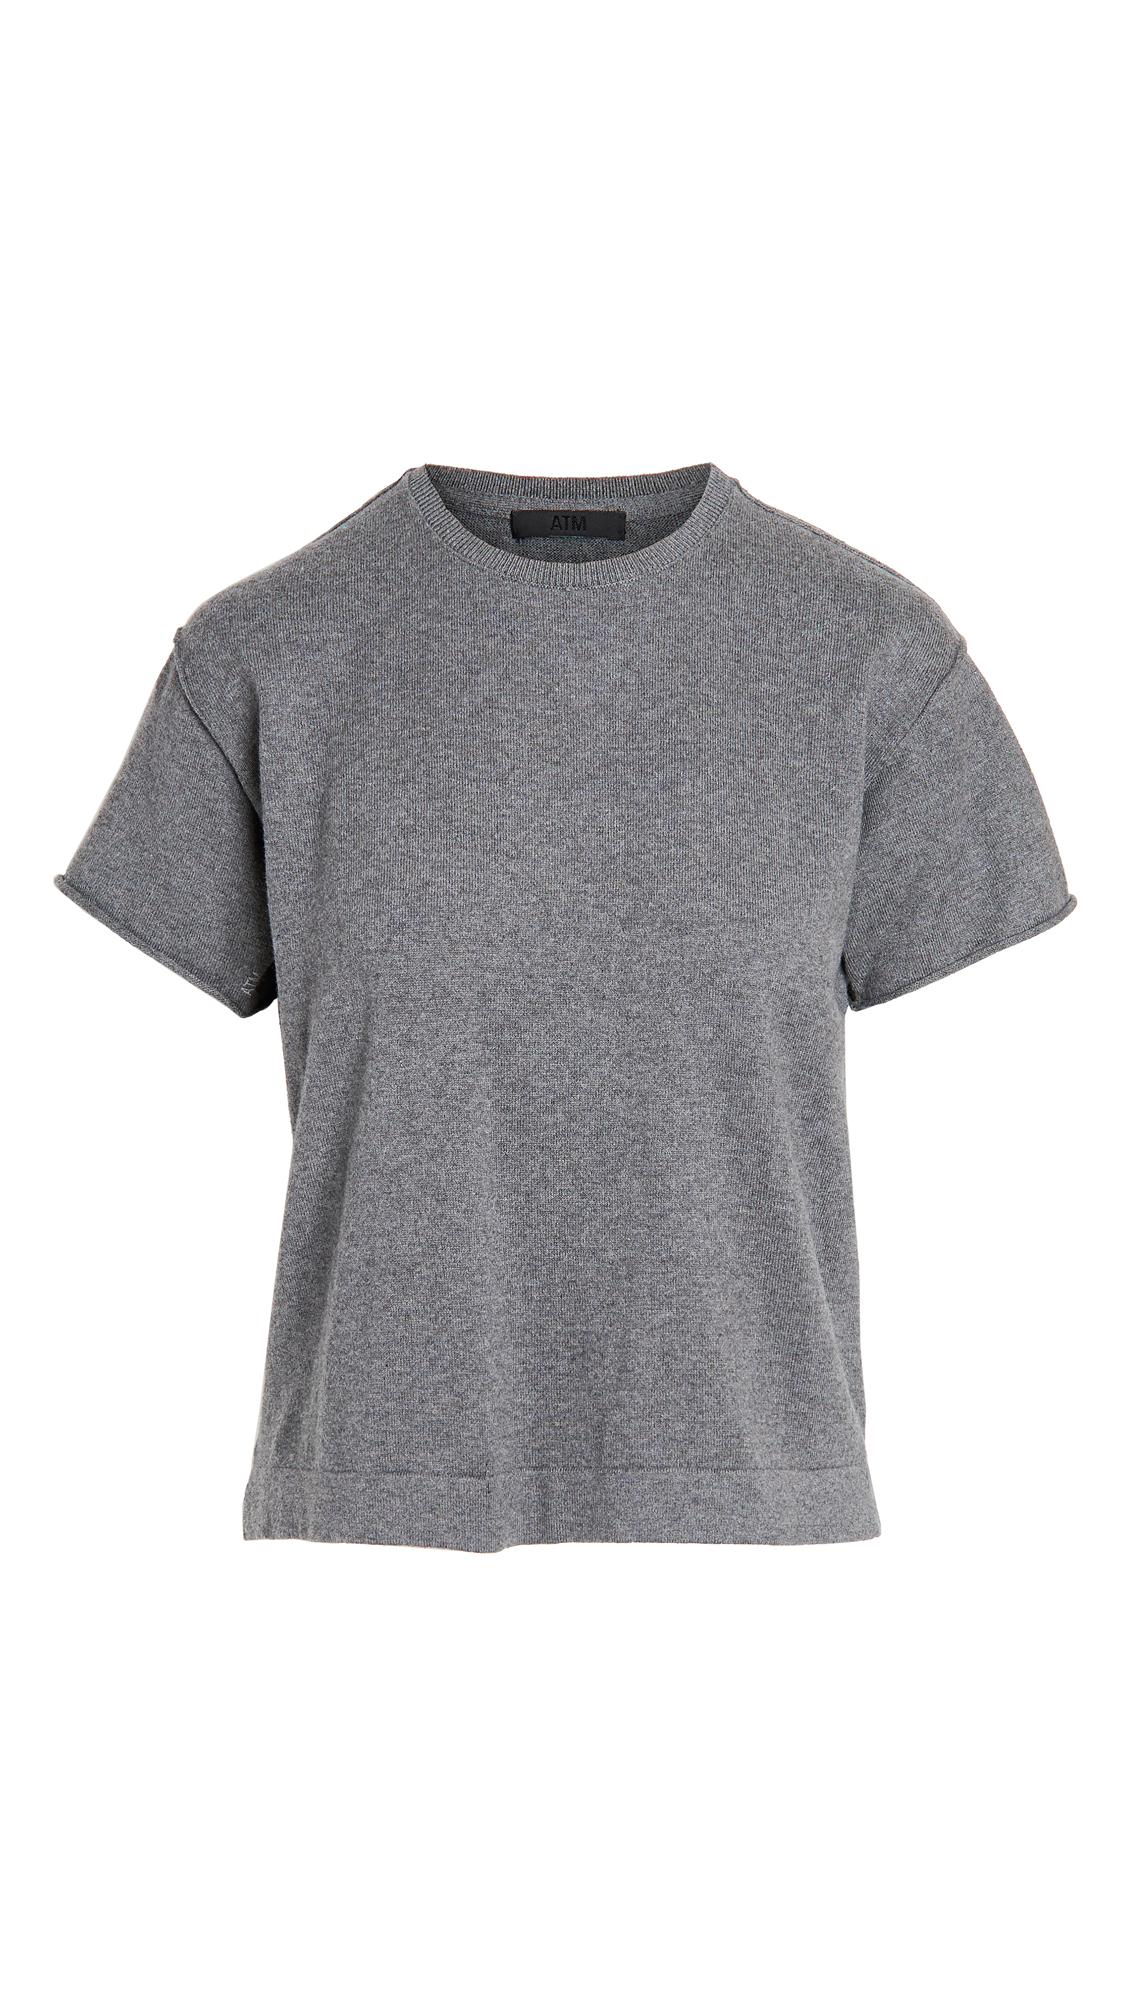 ATM Anthony Thomas Melillo Cotton Cashmere Sweater Tee